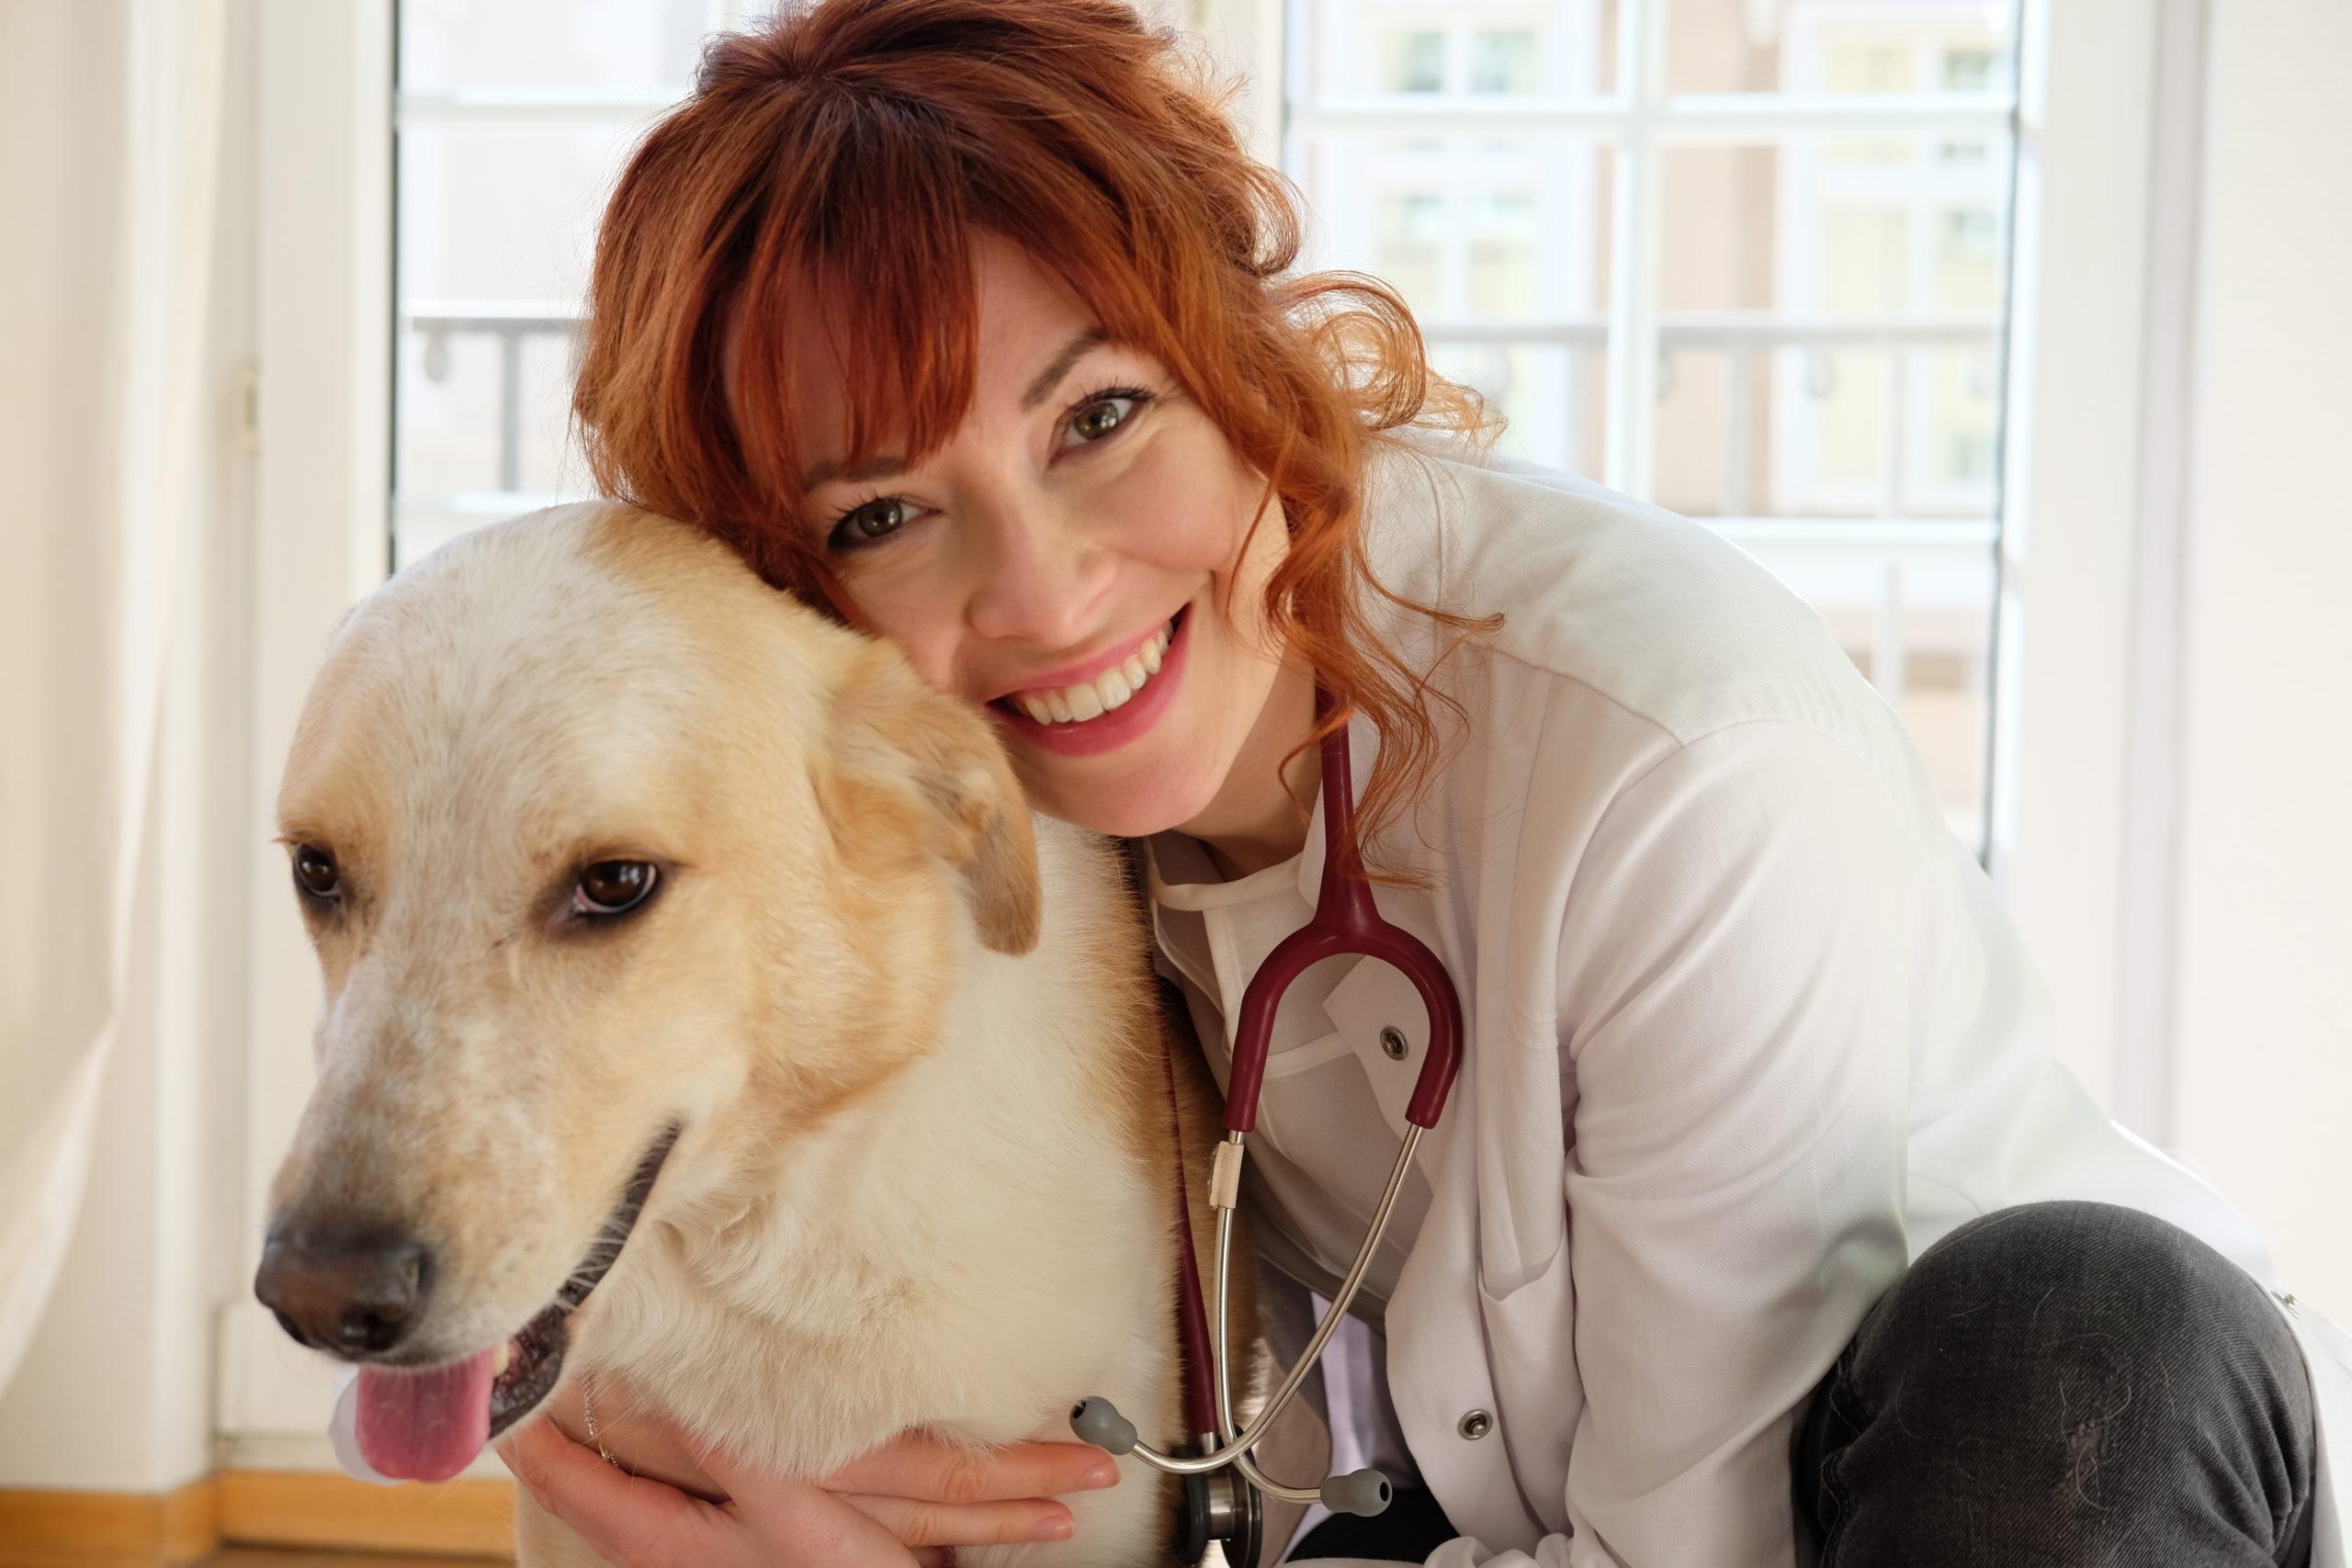 Online-Tierarzt-tierärztliche-Beratung-Vet-Dogs